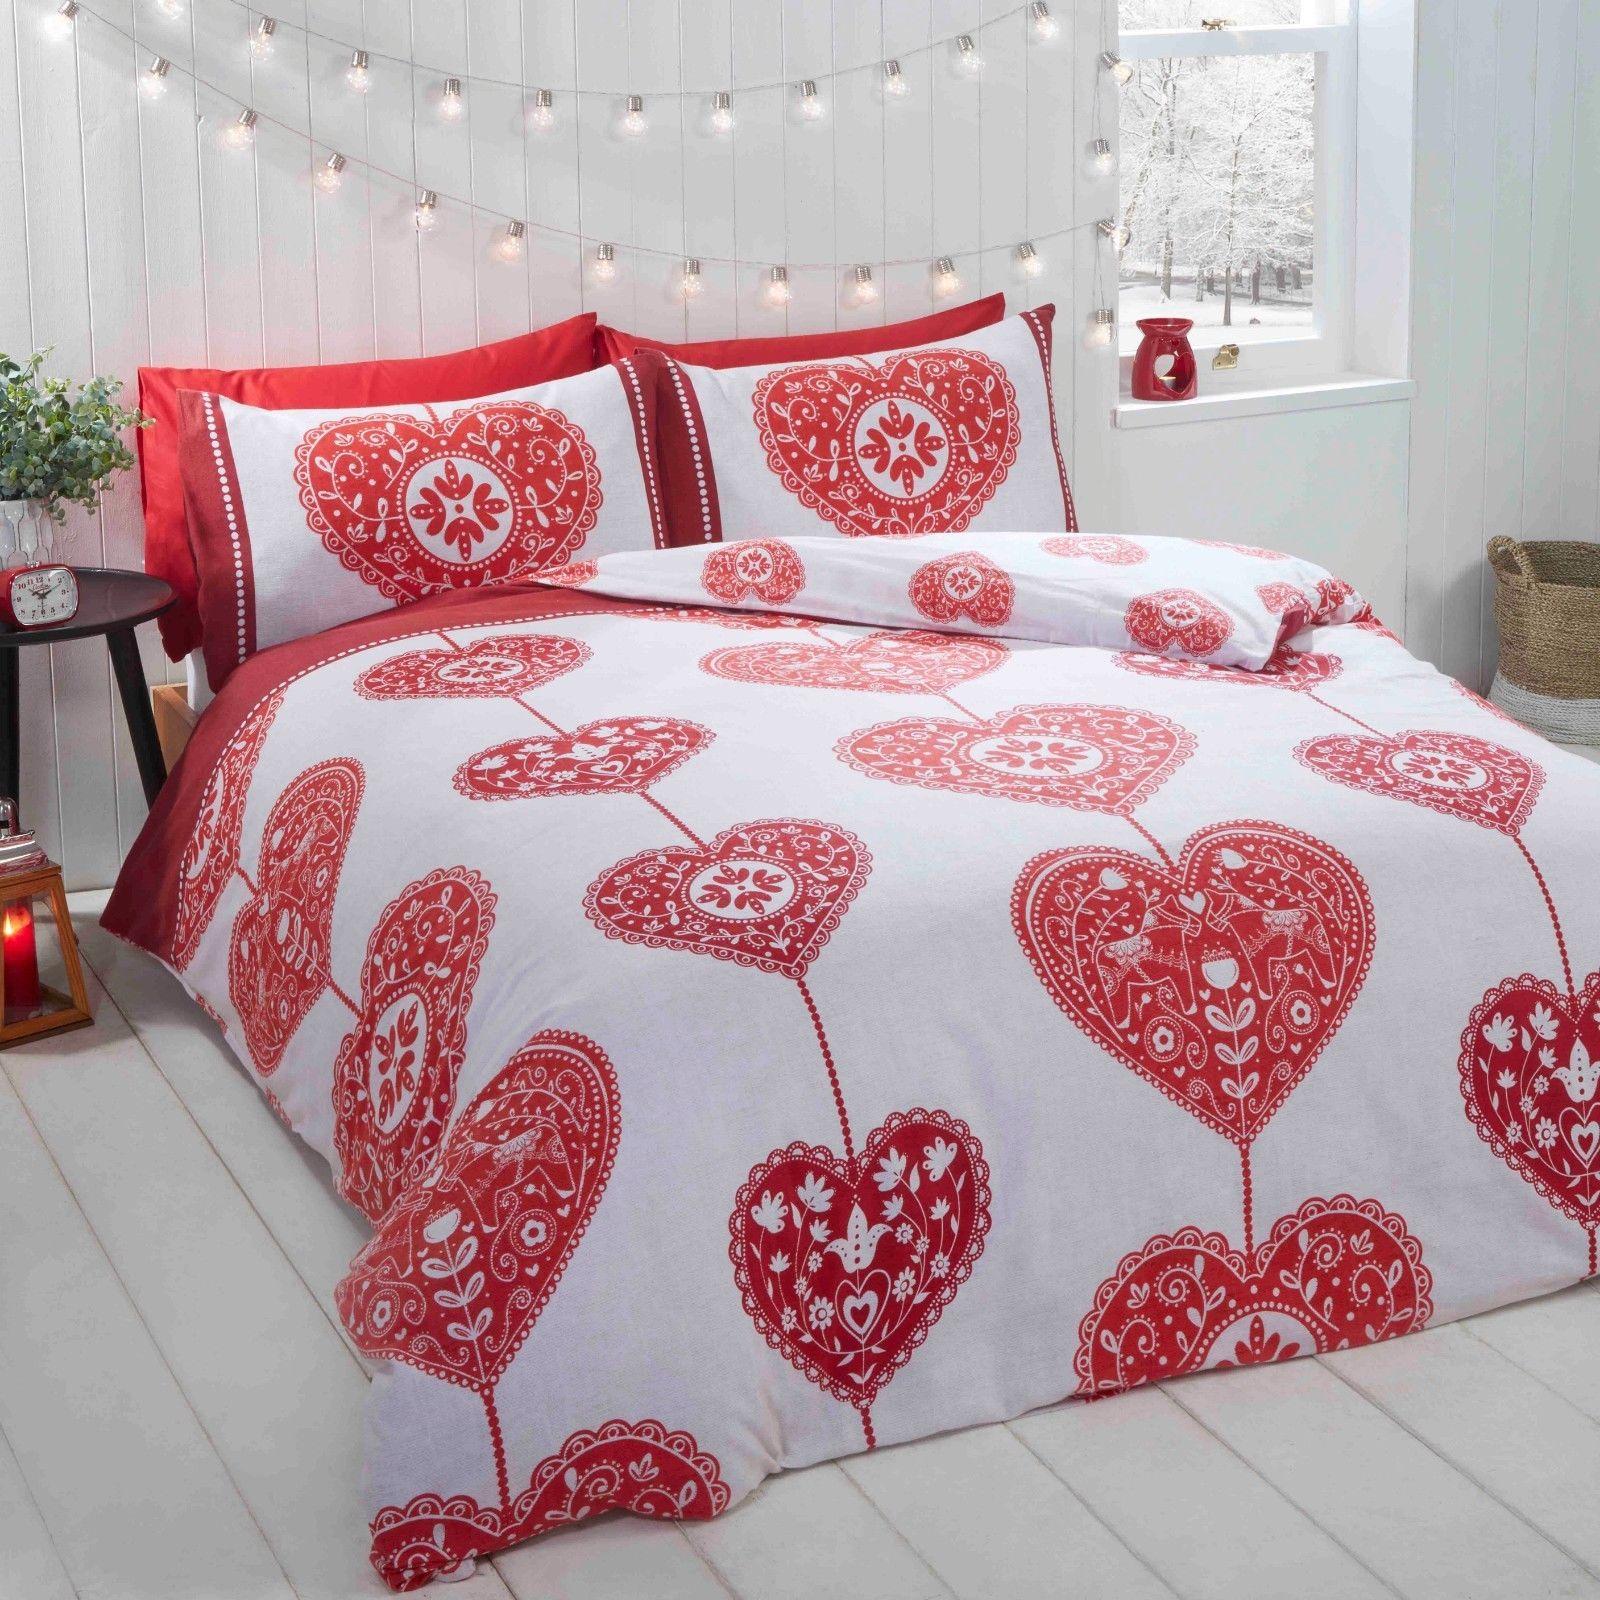 Rapport Skandi Hearts 100 Brushed Cotton Flannelette Duvet